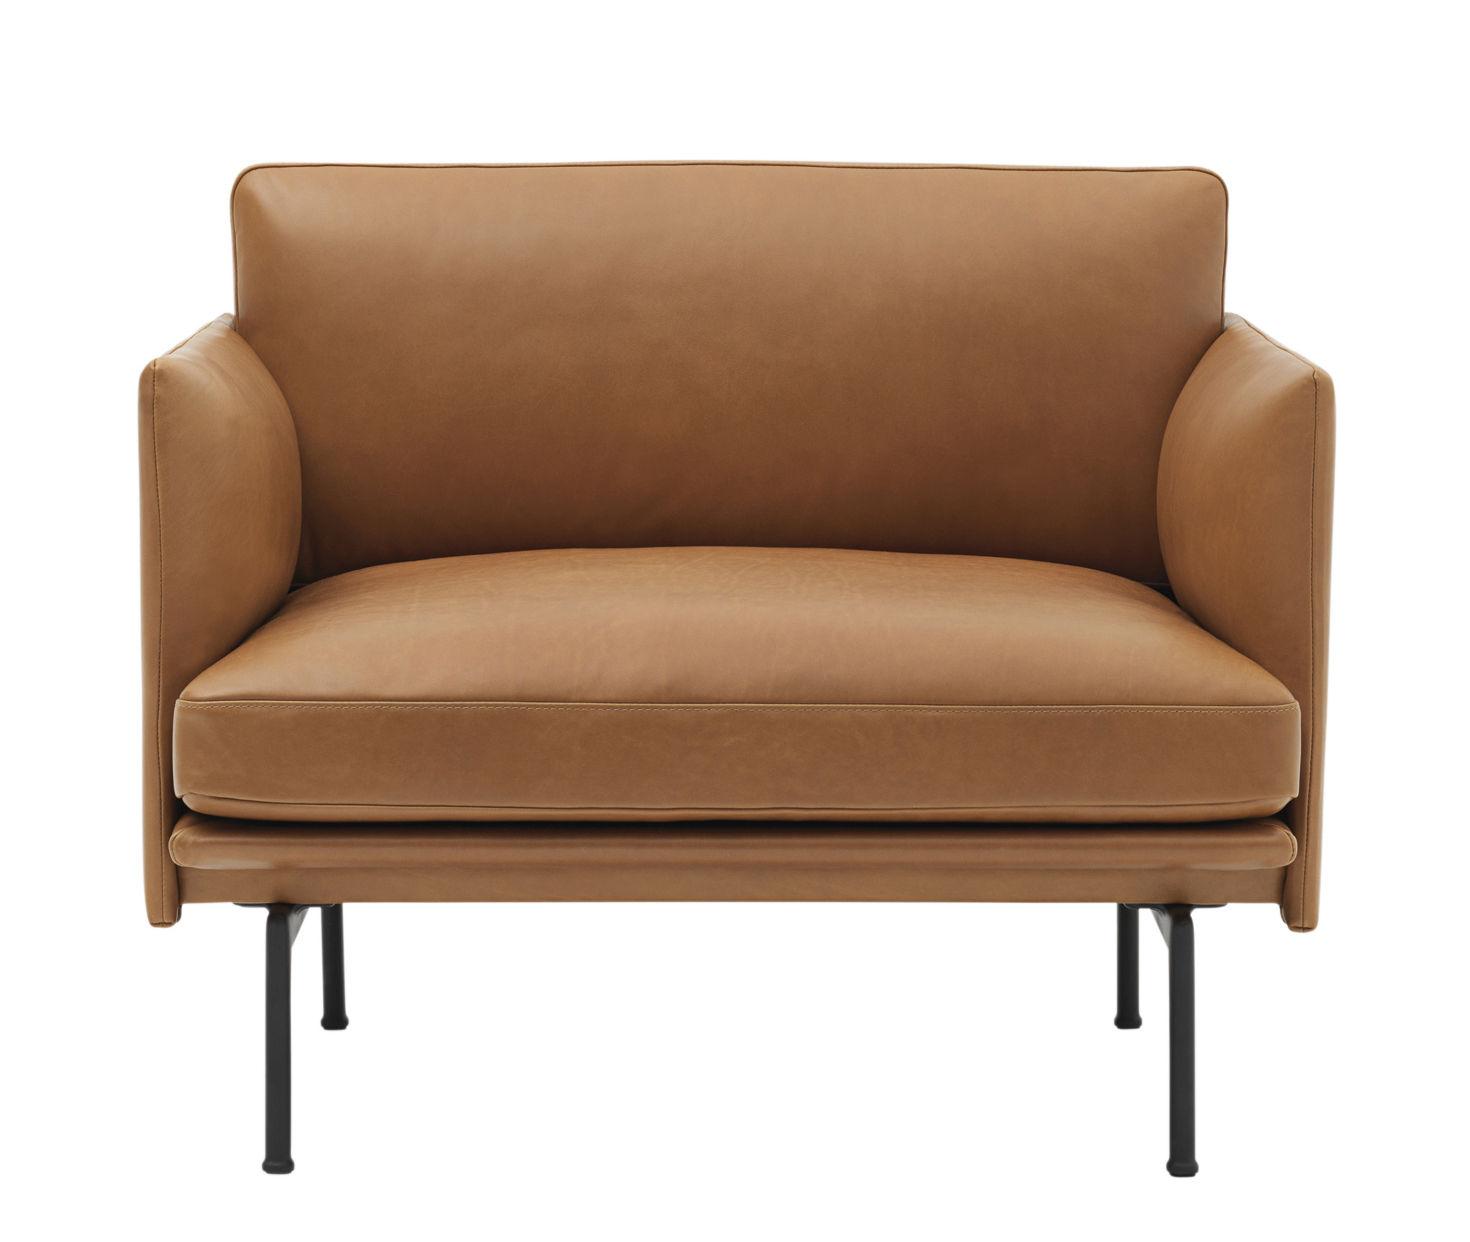 Möbel - Lounge Sessel - Outline Gepolsterter Sessel / Leder - Muuto - Lederbezug cognacfarben / Füße schwarz - Cuir pleine fleur, High Density-Schaum, lackiertes Aluminium, Plumes